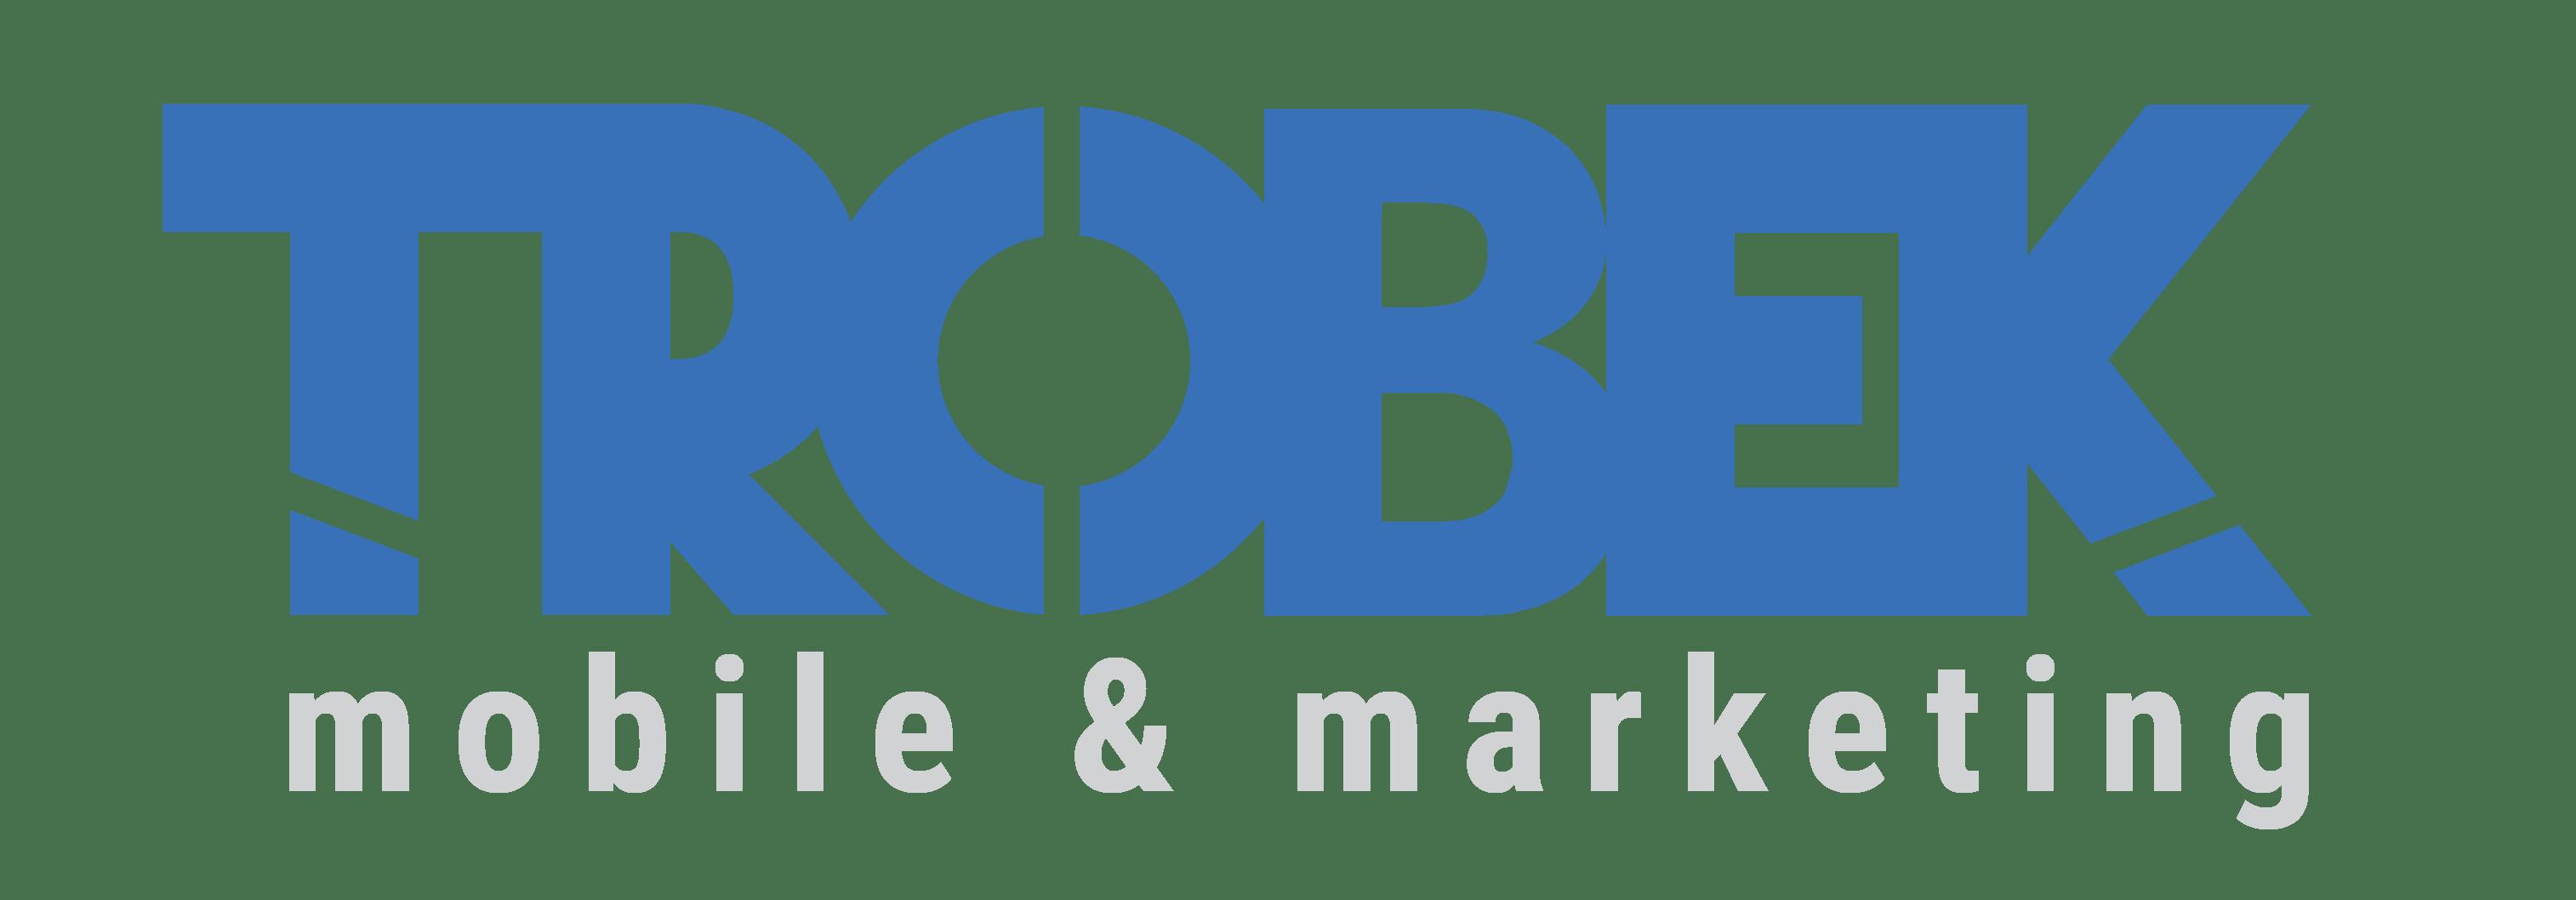 Trobek: Mobile & Marketing